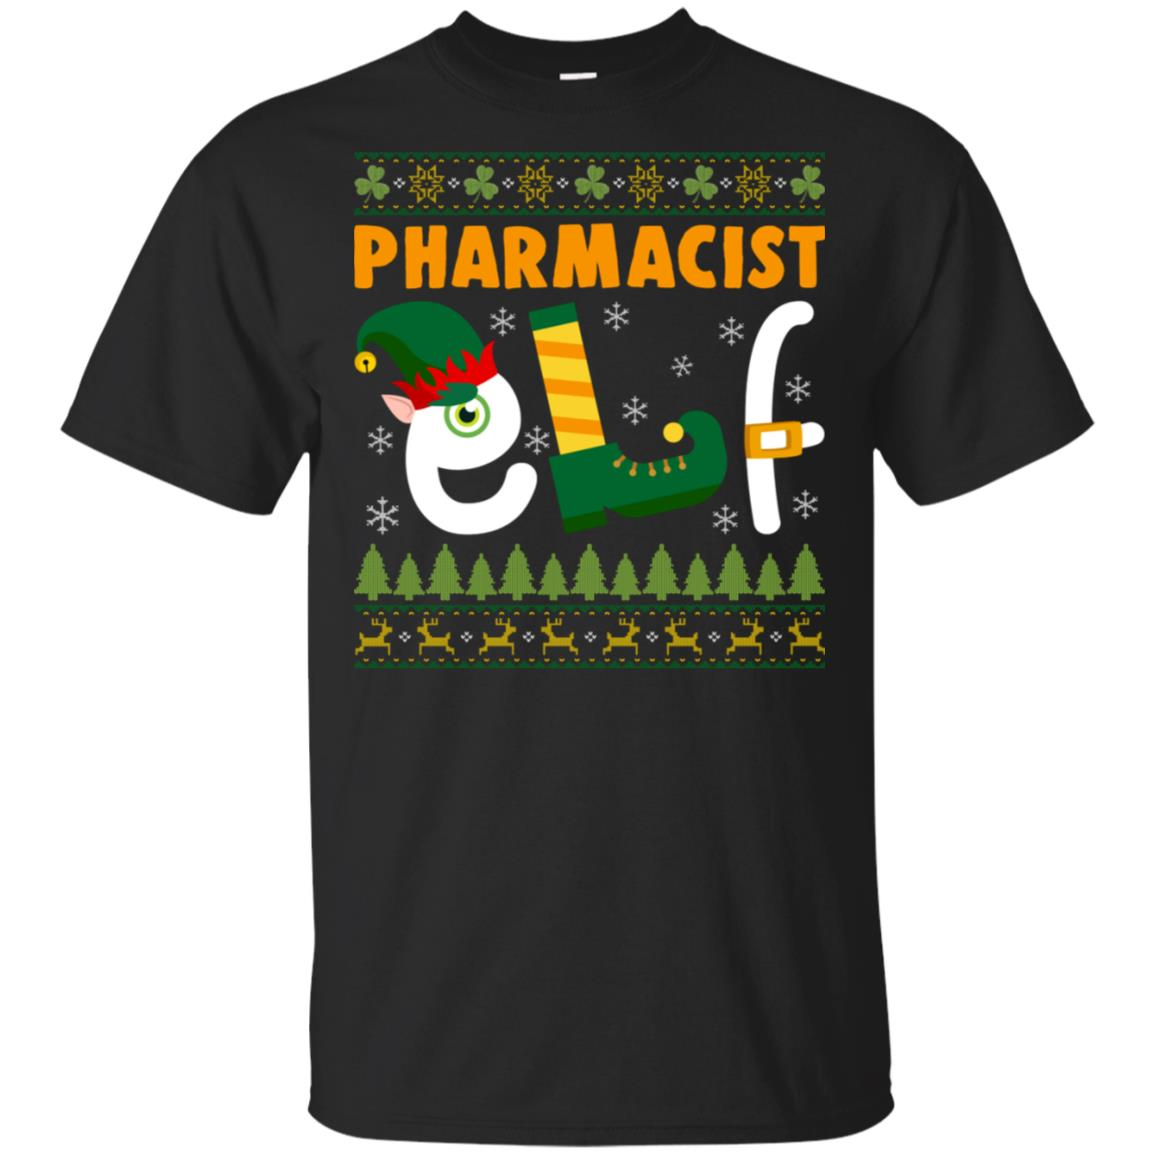 Pharmacist Elf Unisex Short Sleeve